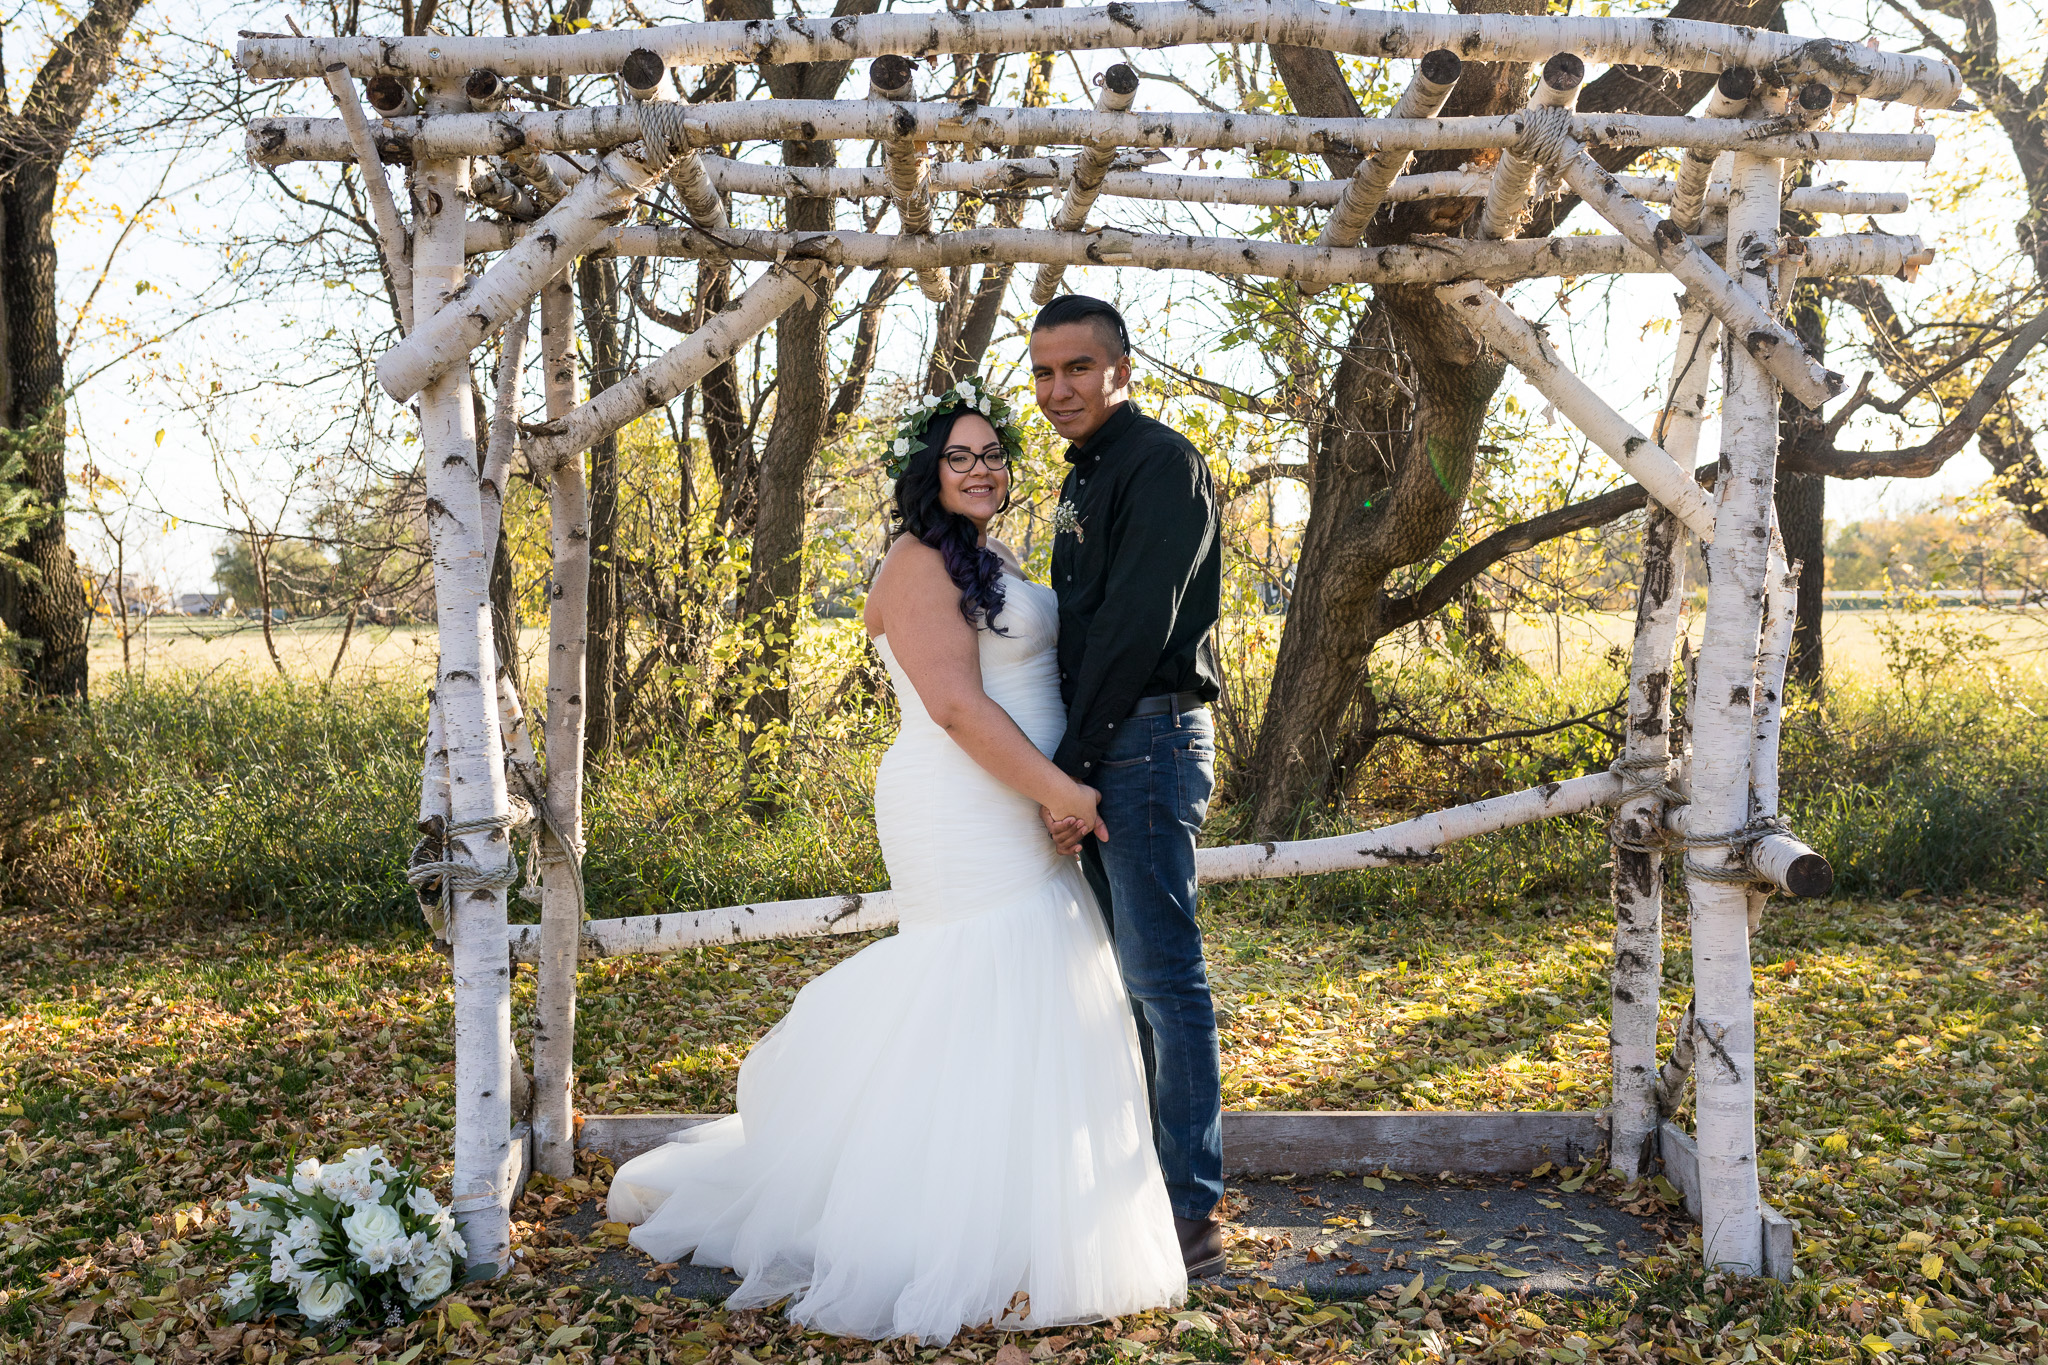 evergreen-village-winnipeg-wedding-39.jpg